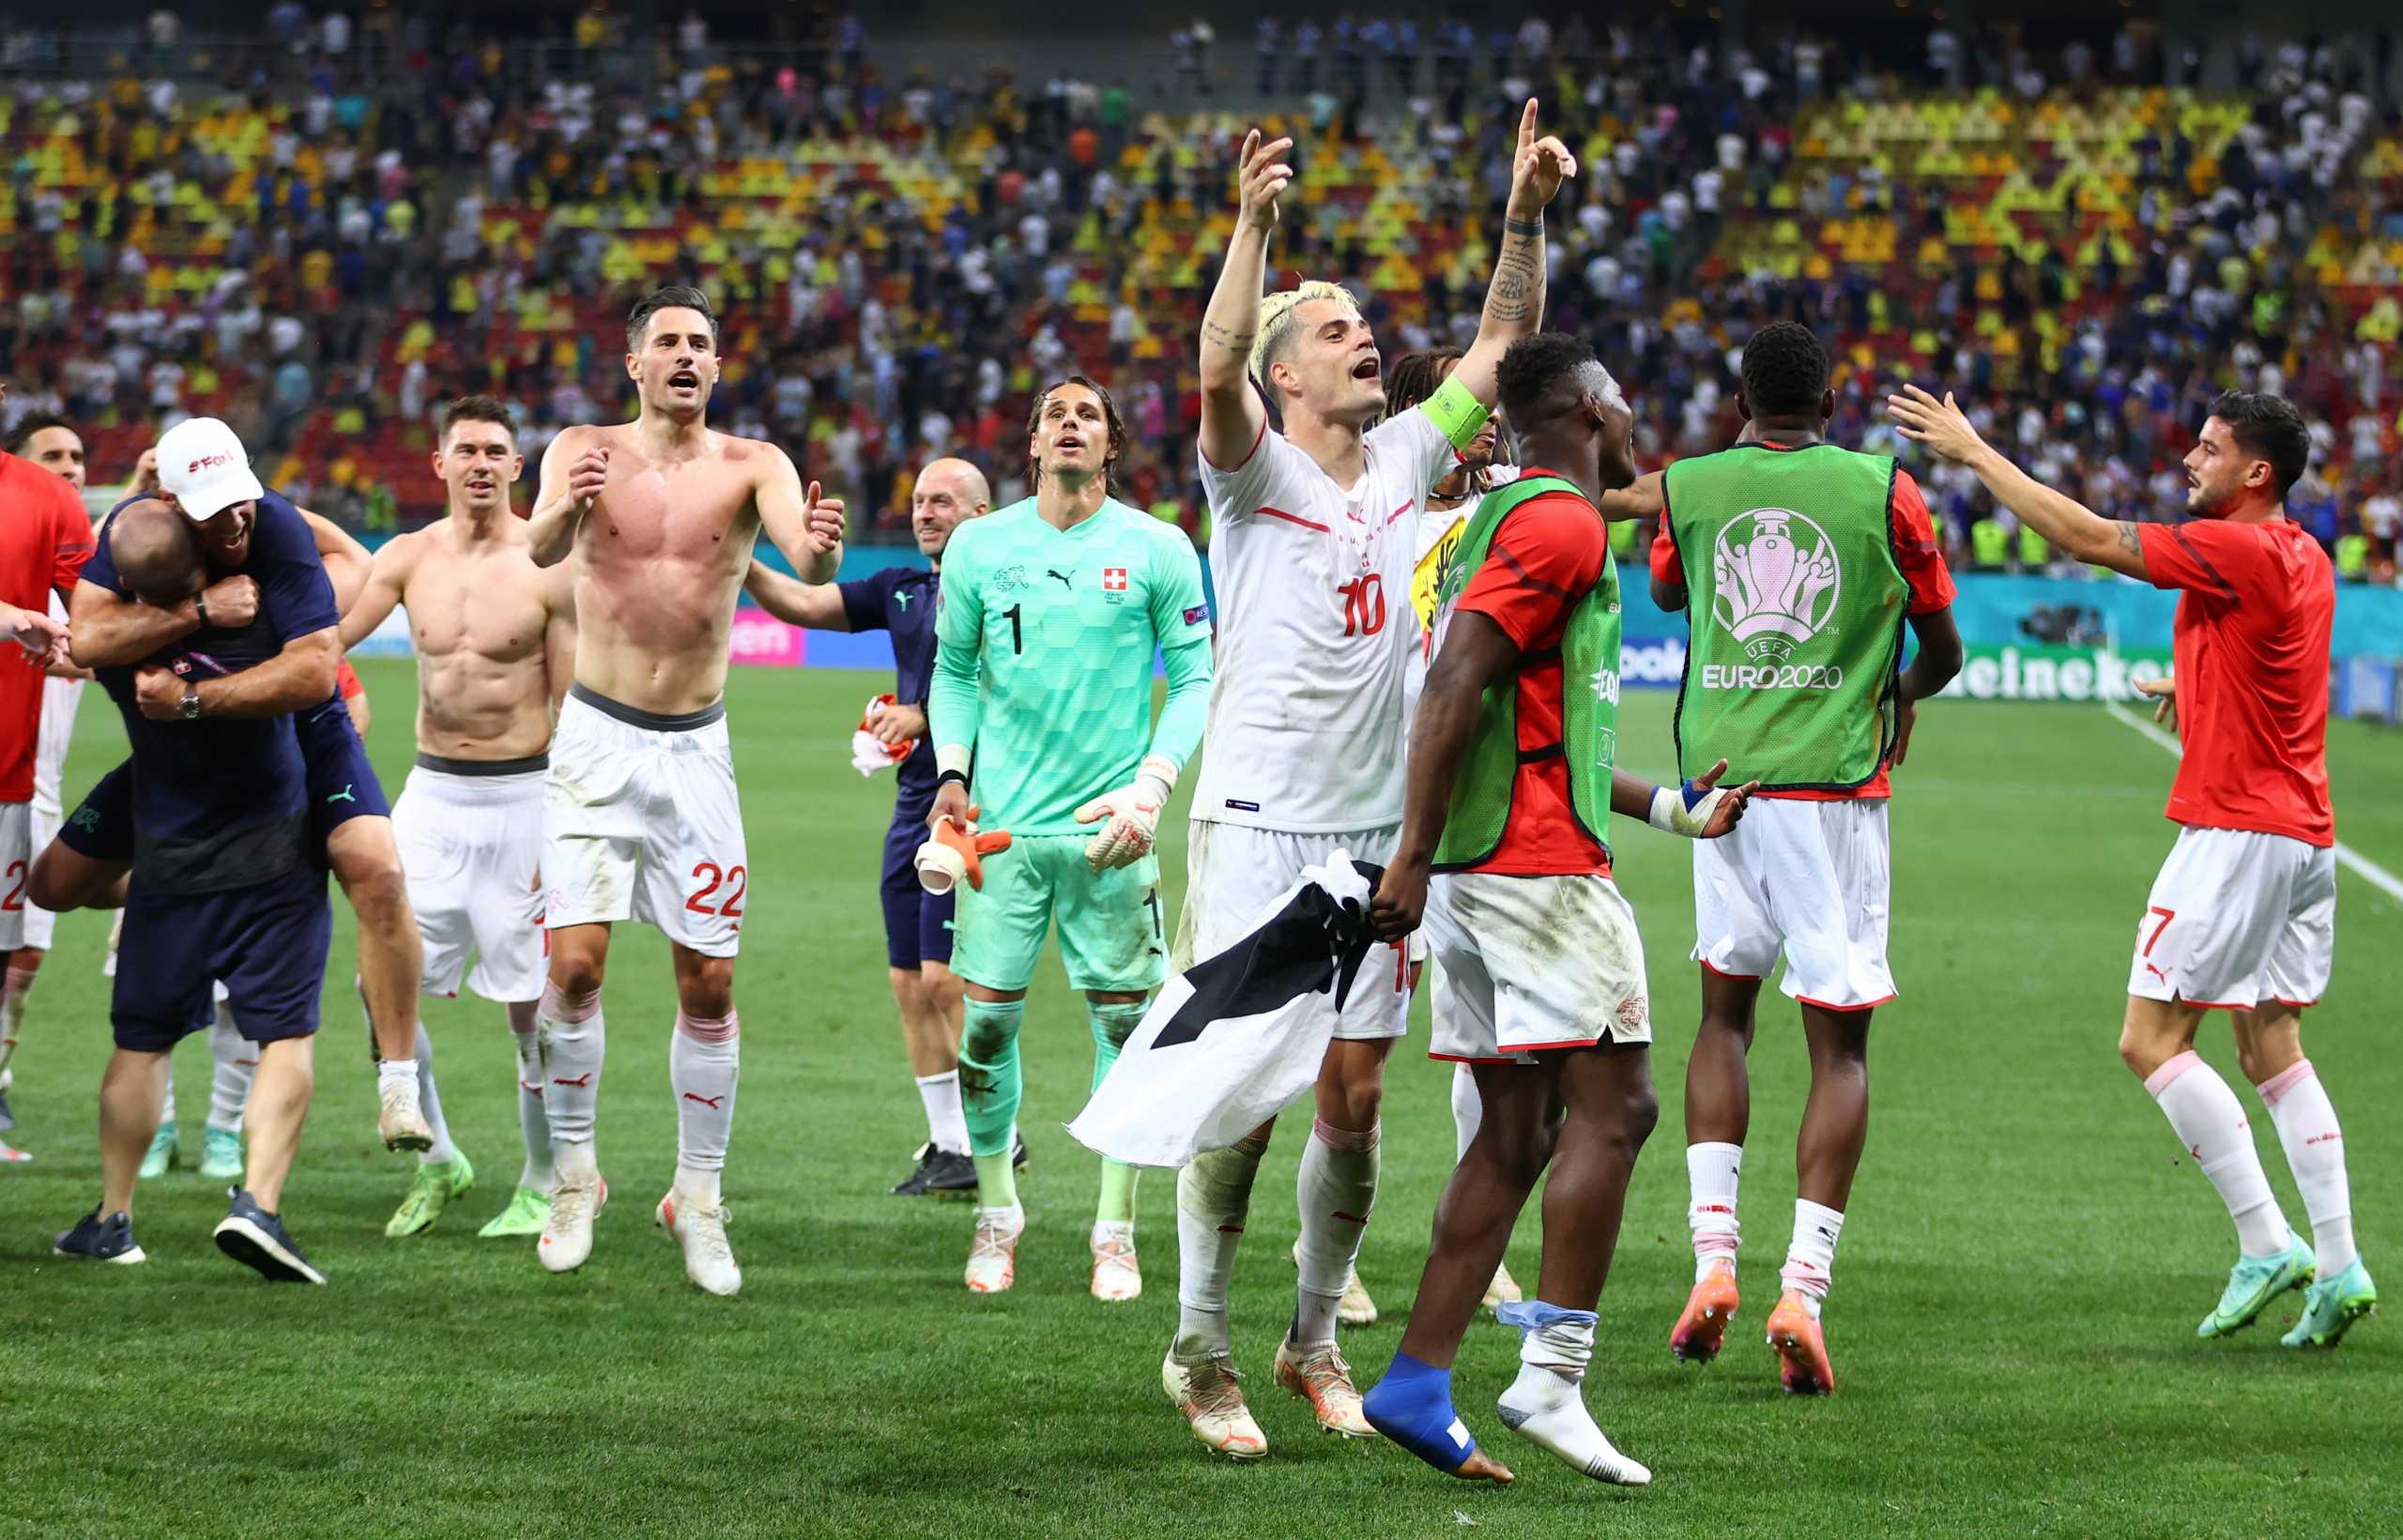 Euro 2020, Γαλλία – Ελβετία: Τα highlights μιας τεράστιας έκπληξης